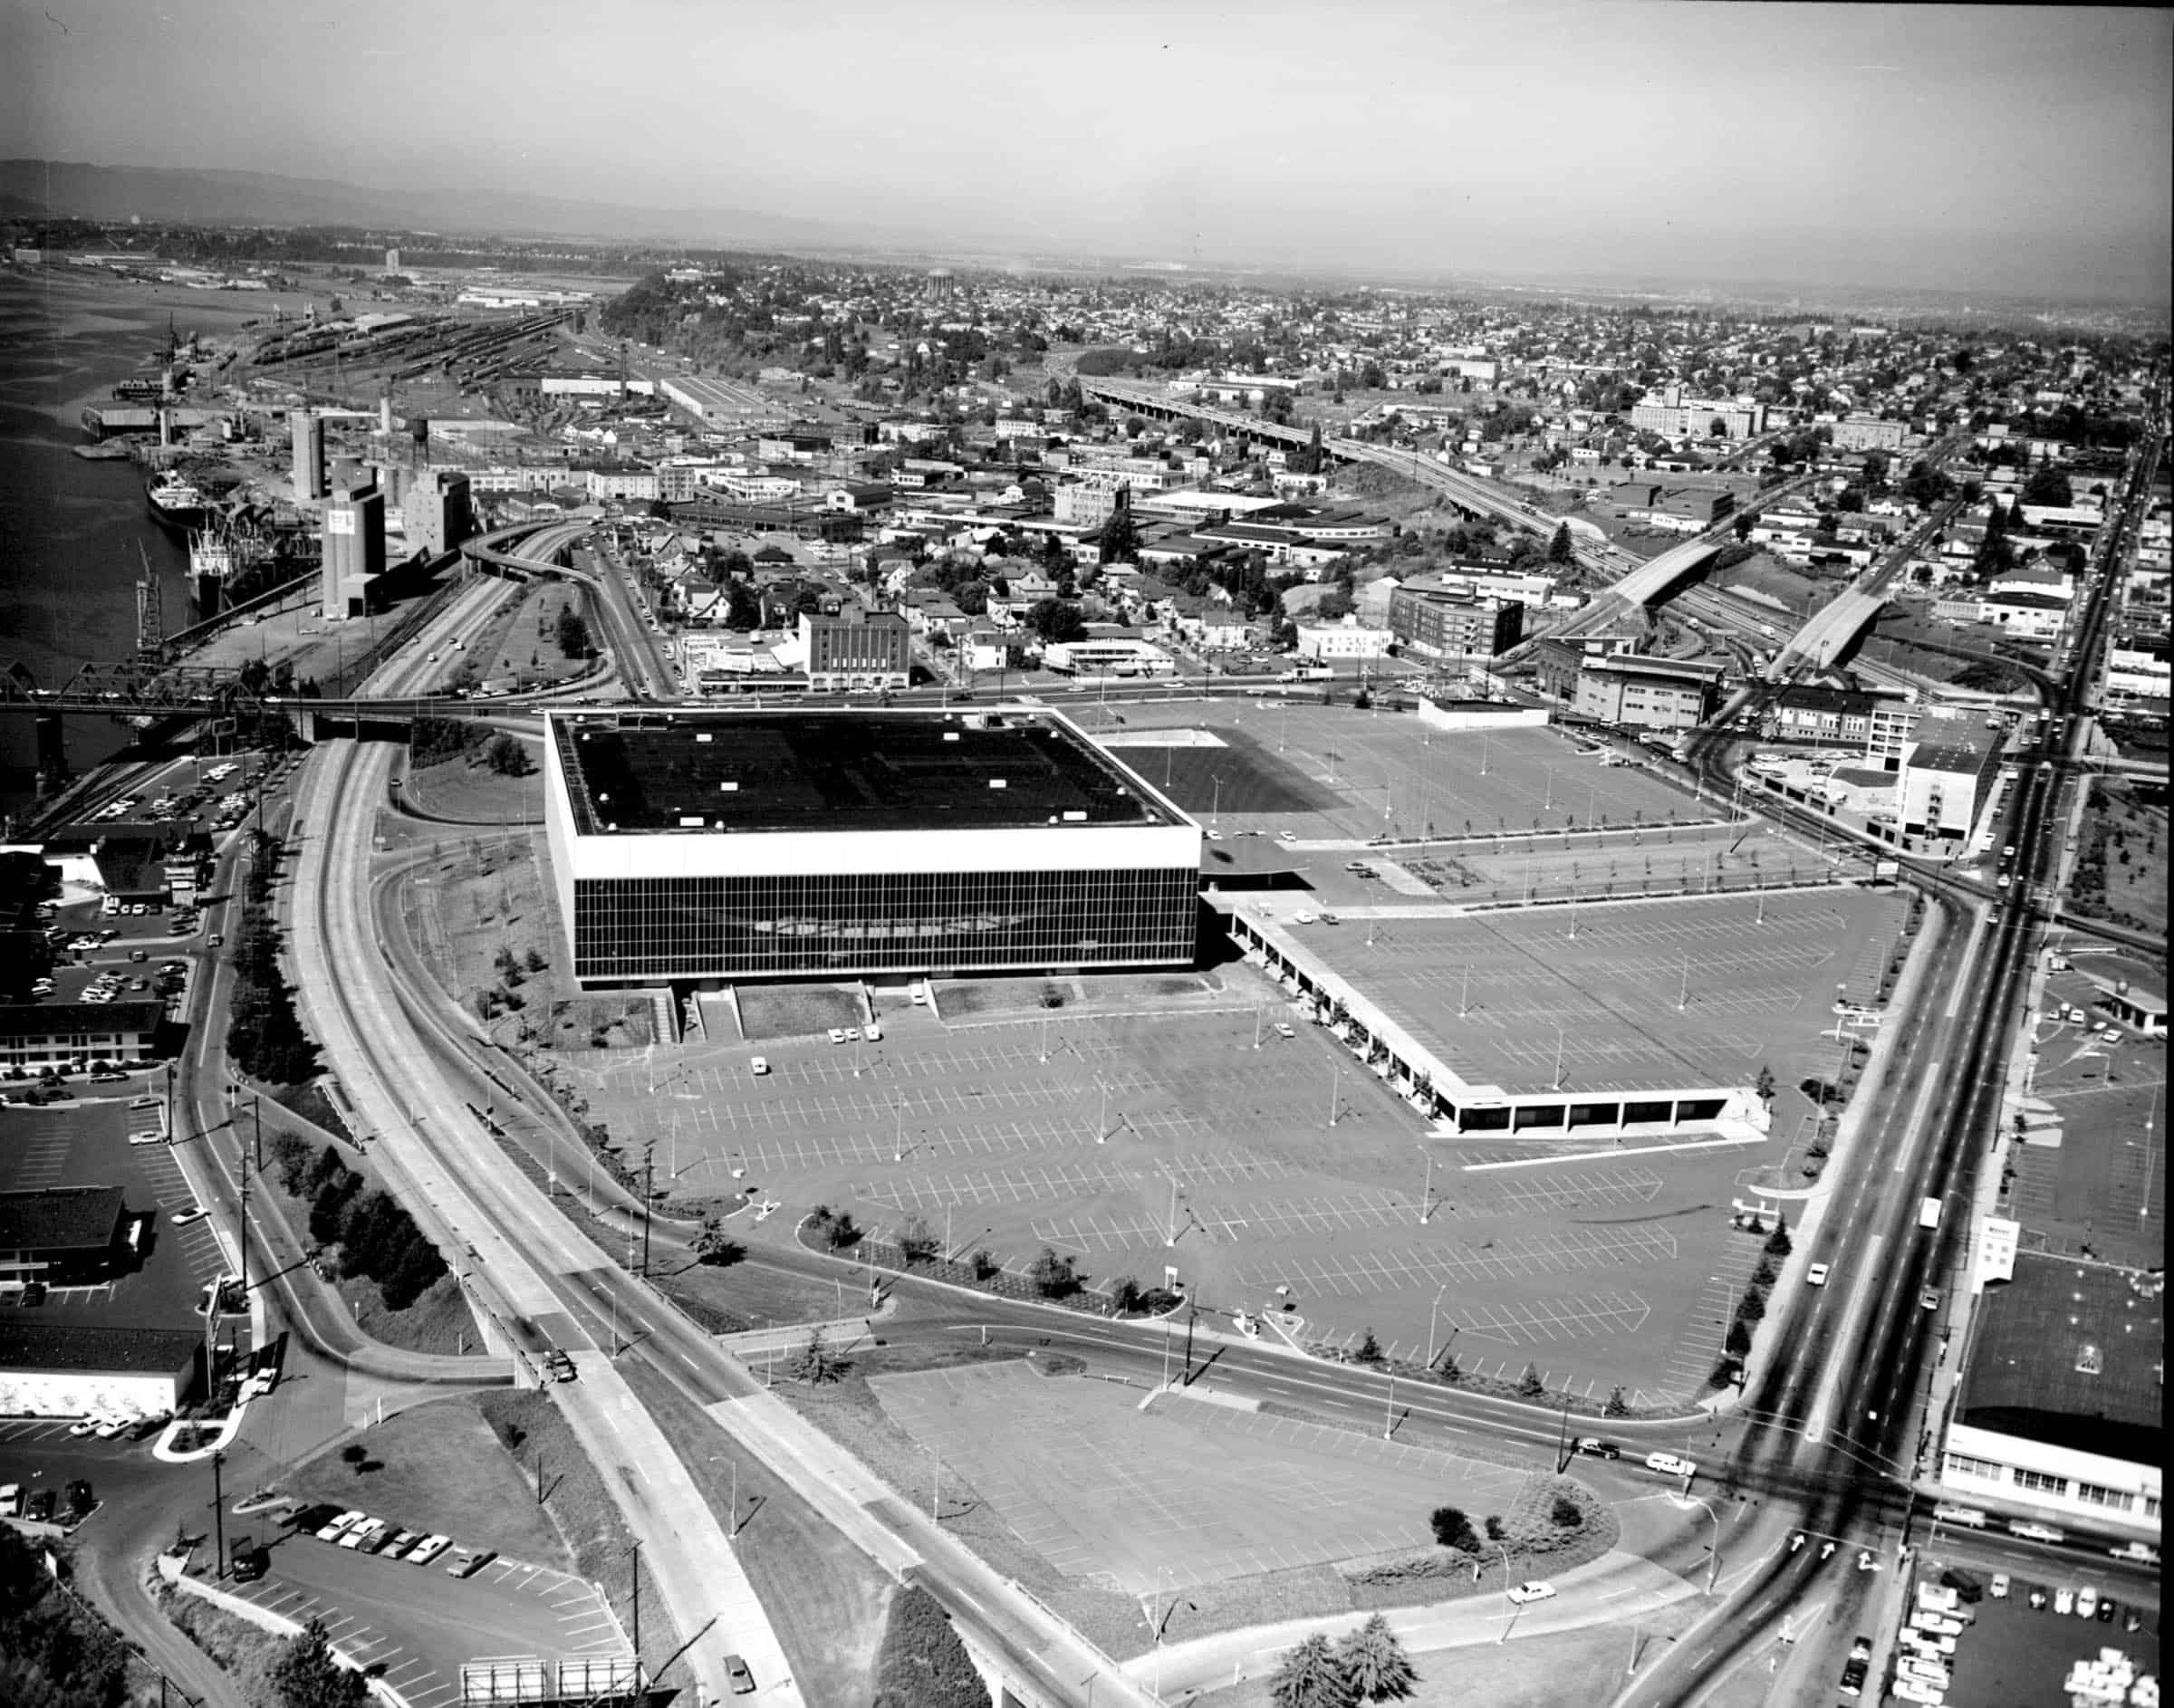 Veterans Memorial Coliseum 1969